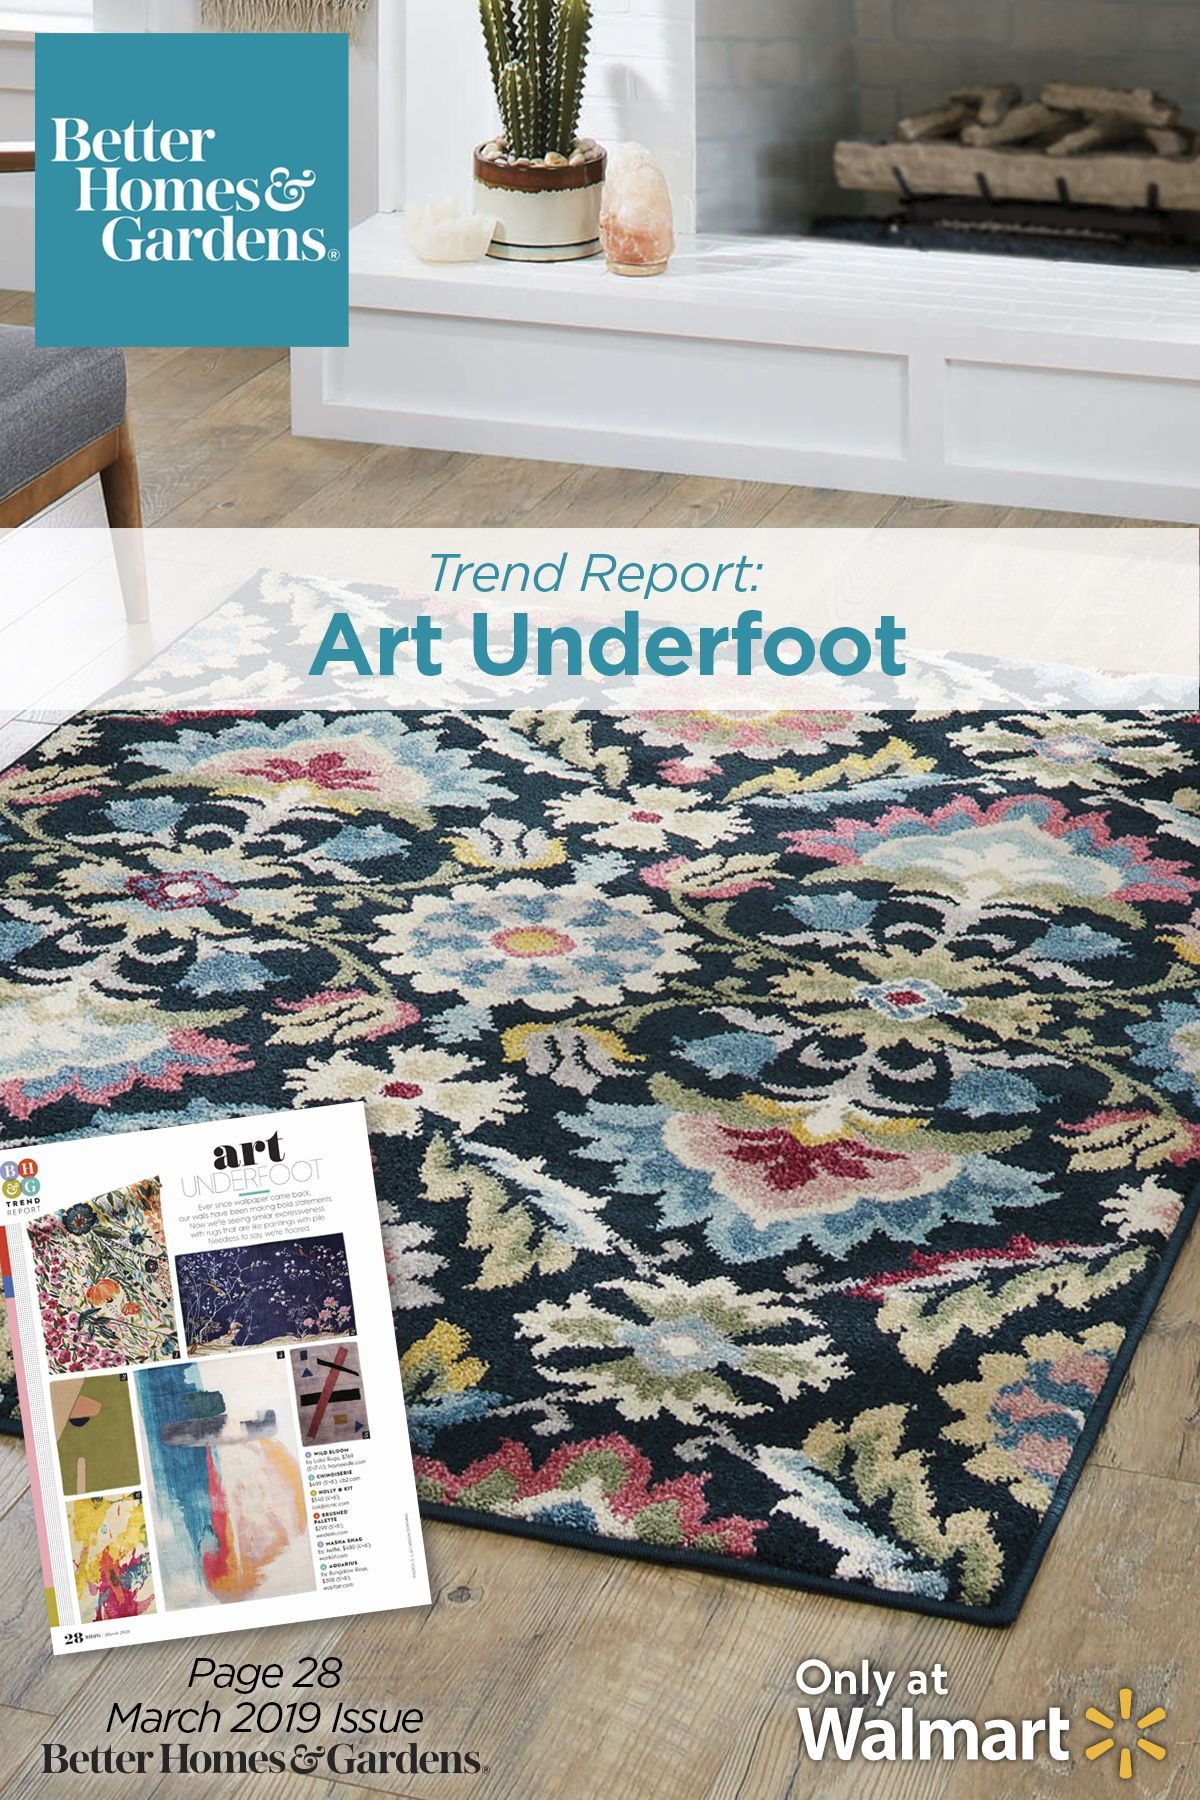 Art Underfoot Trend Bhg Trend Better Homes Gardens Area